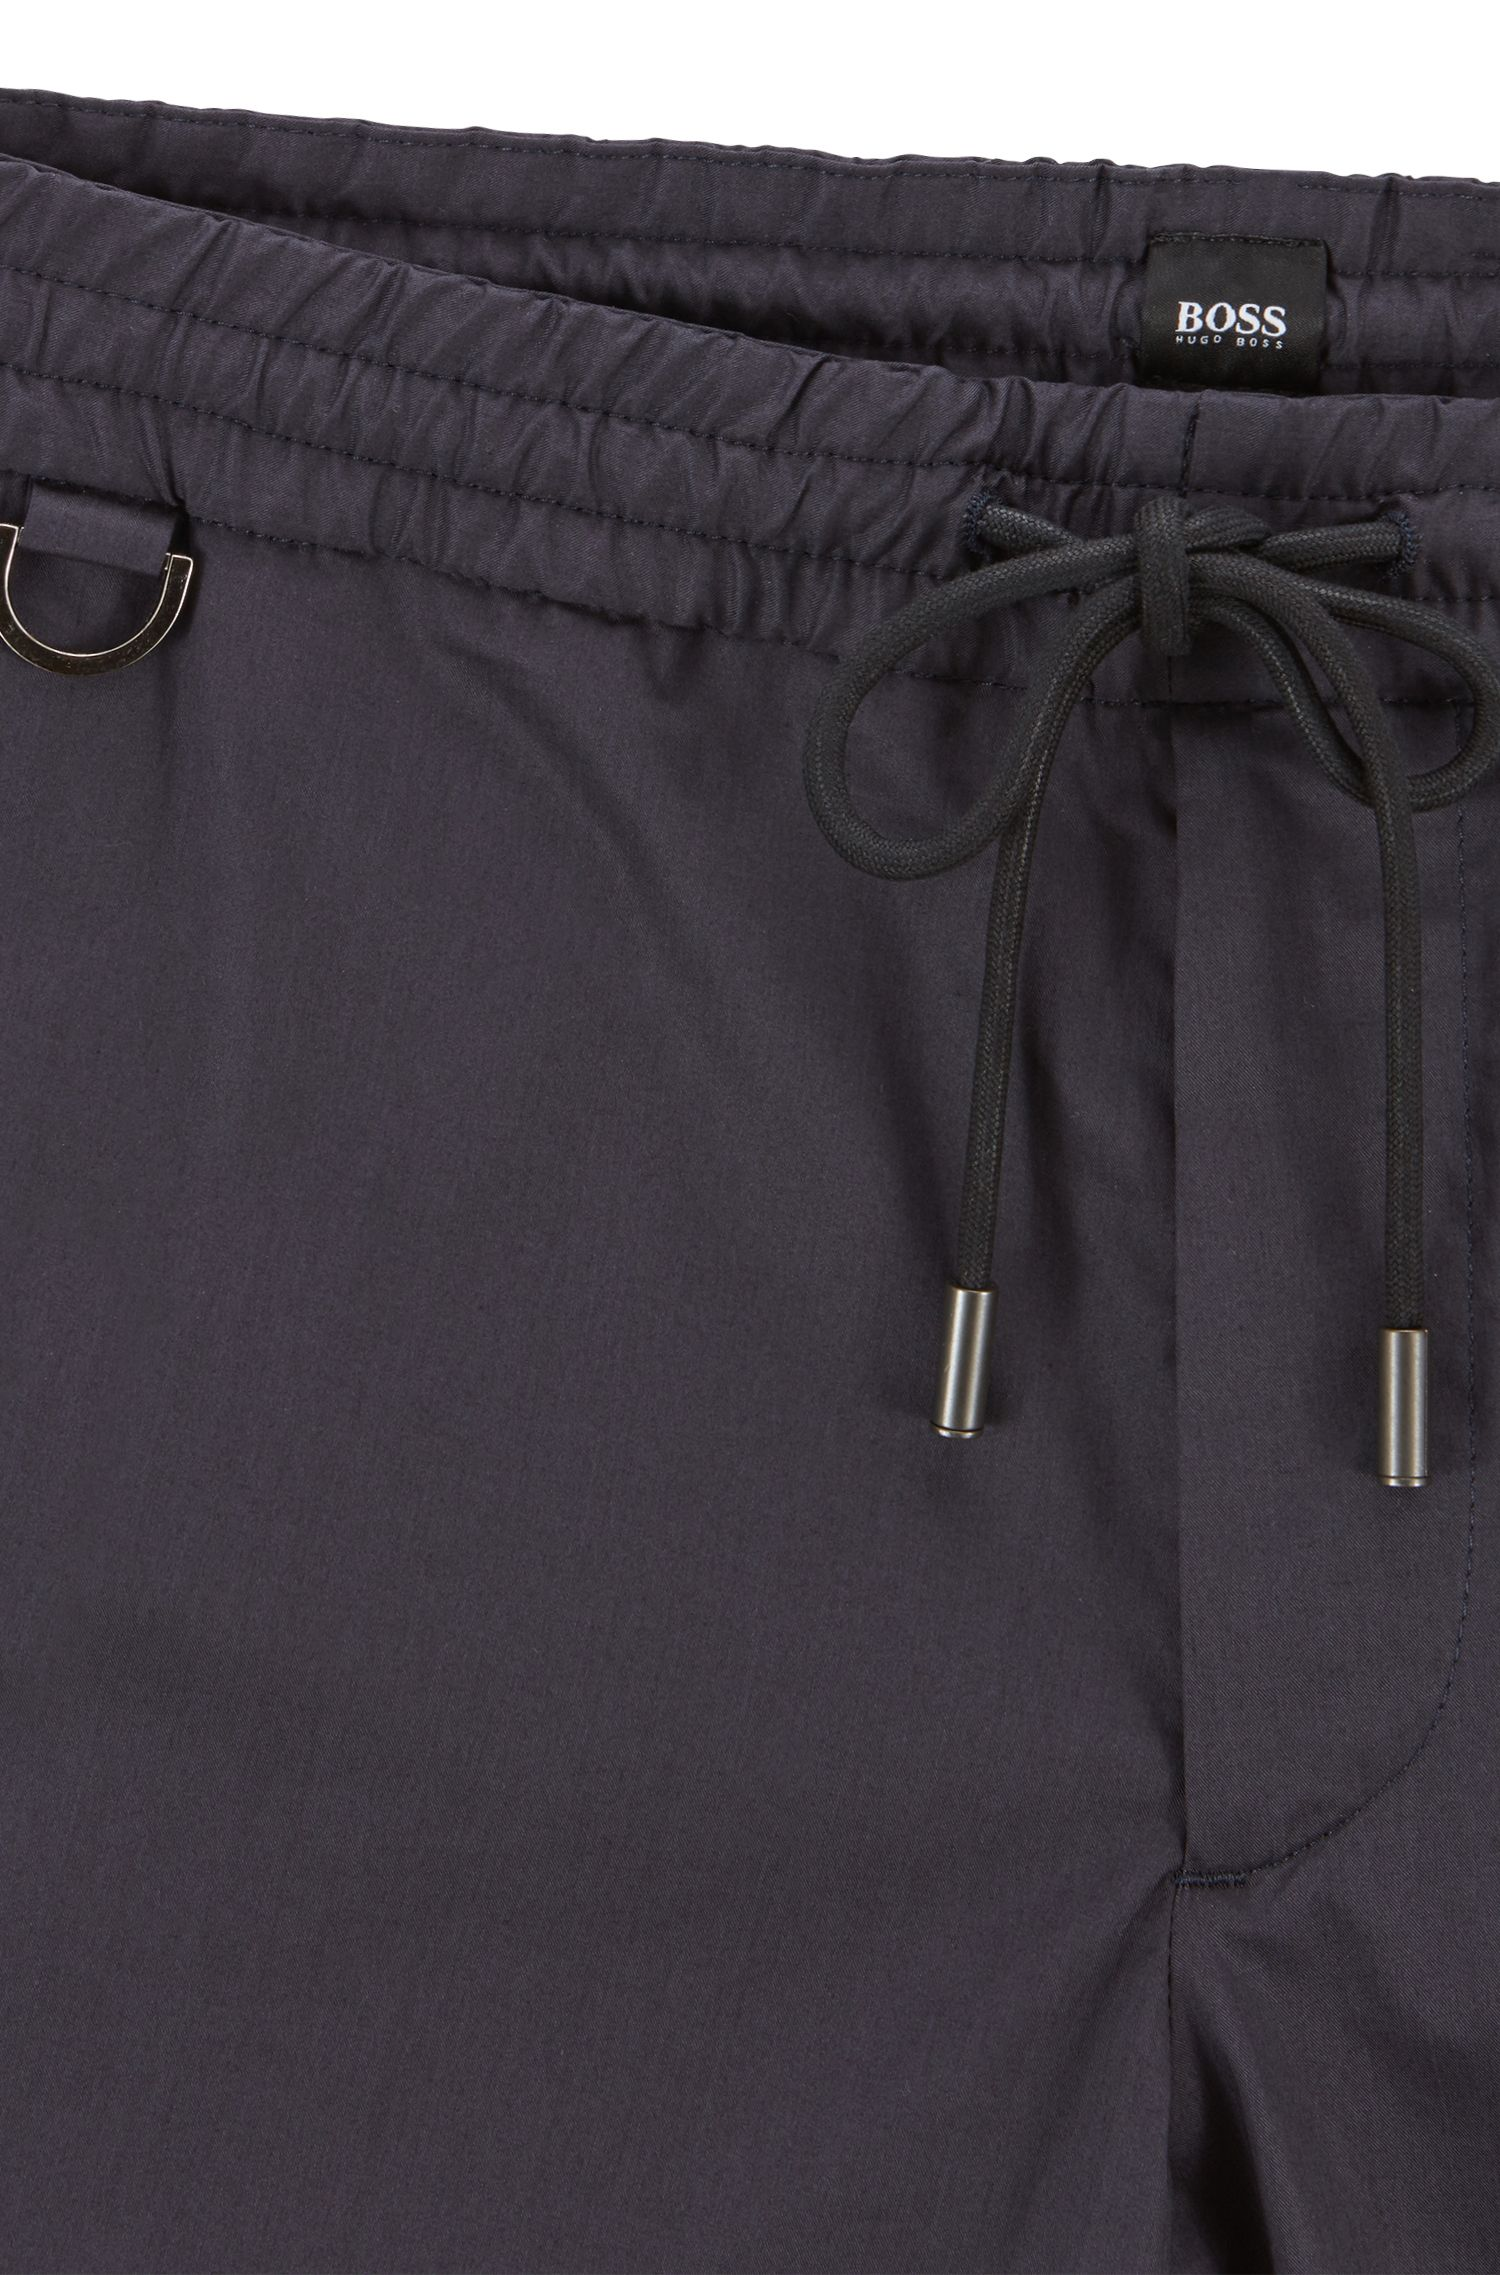 Slim-fit pants in Italian stretch cotton , Dark Blue